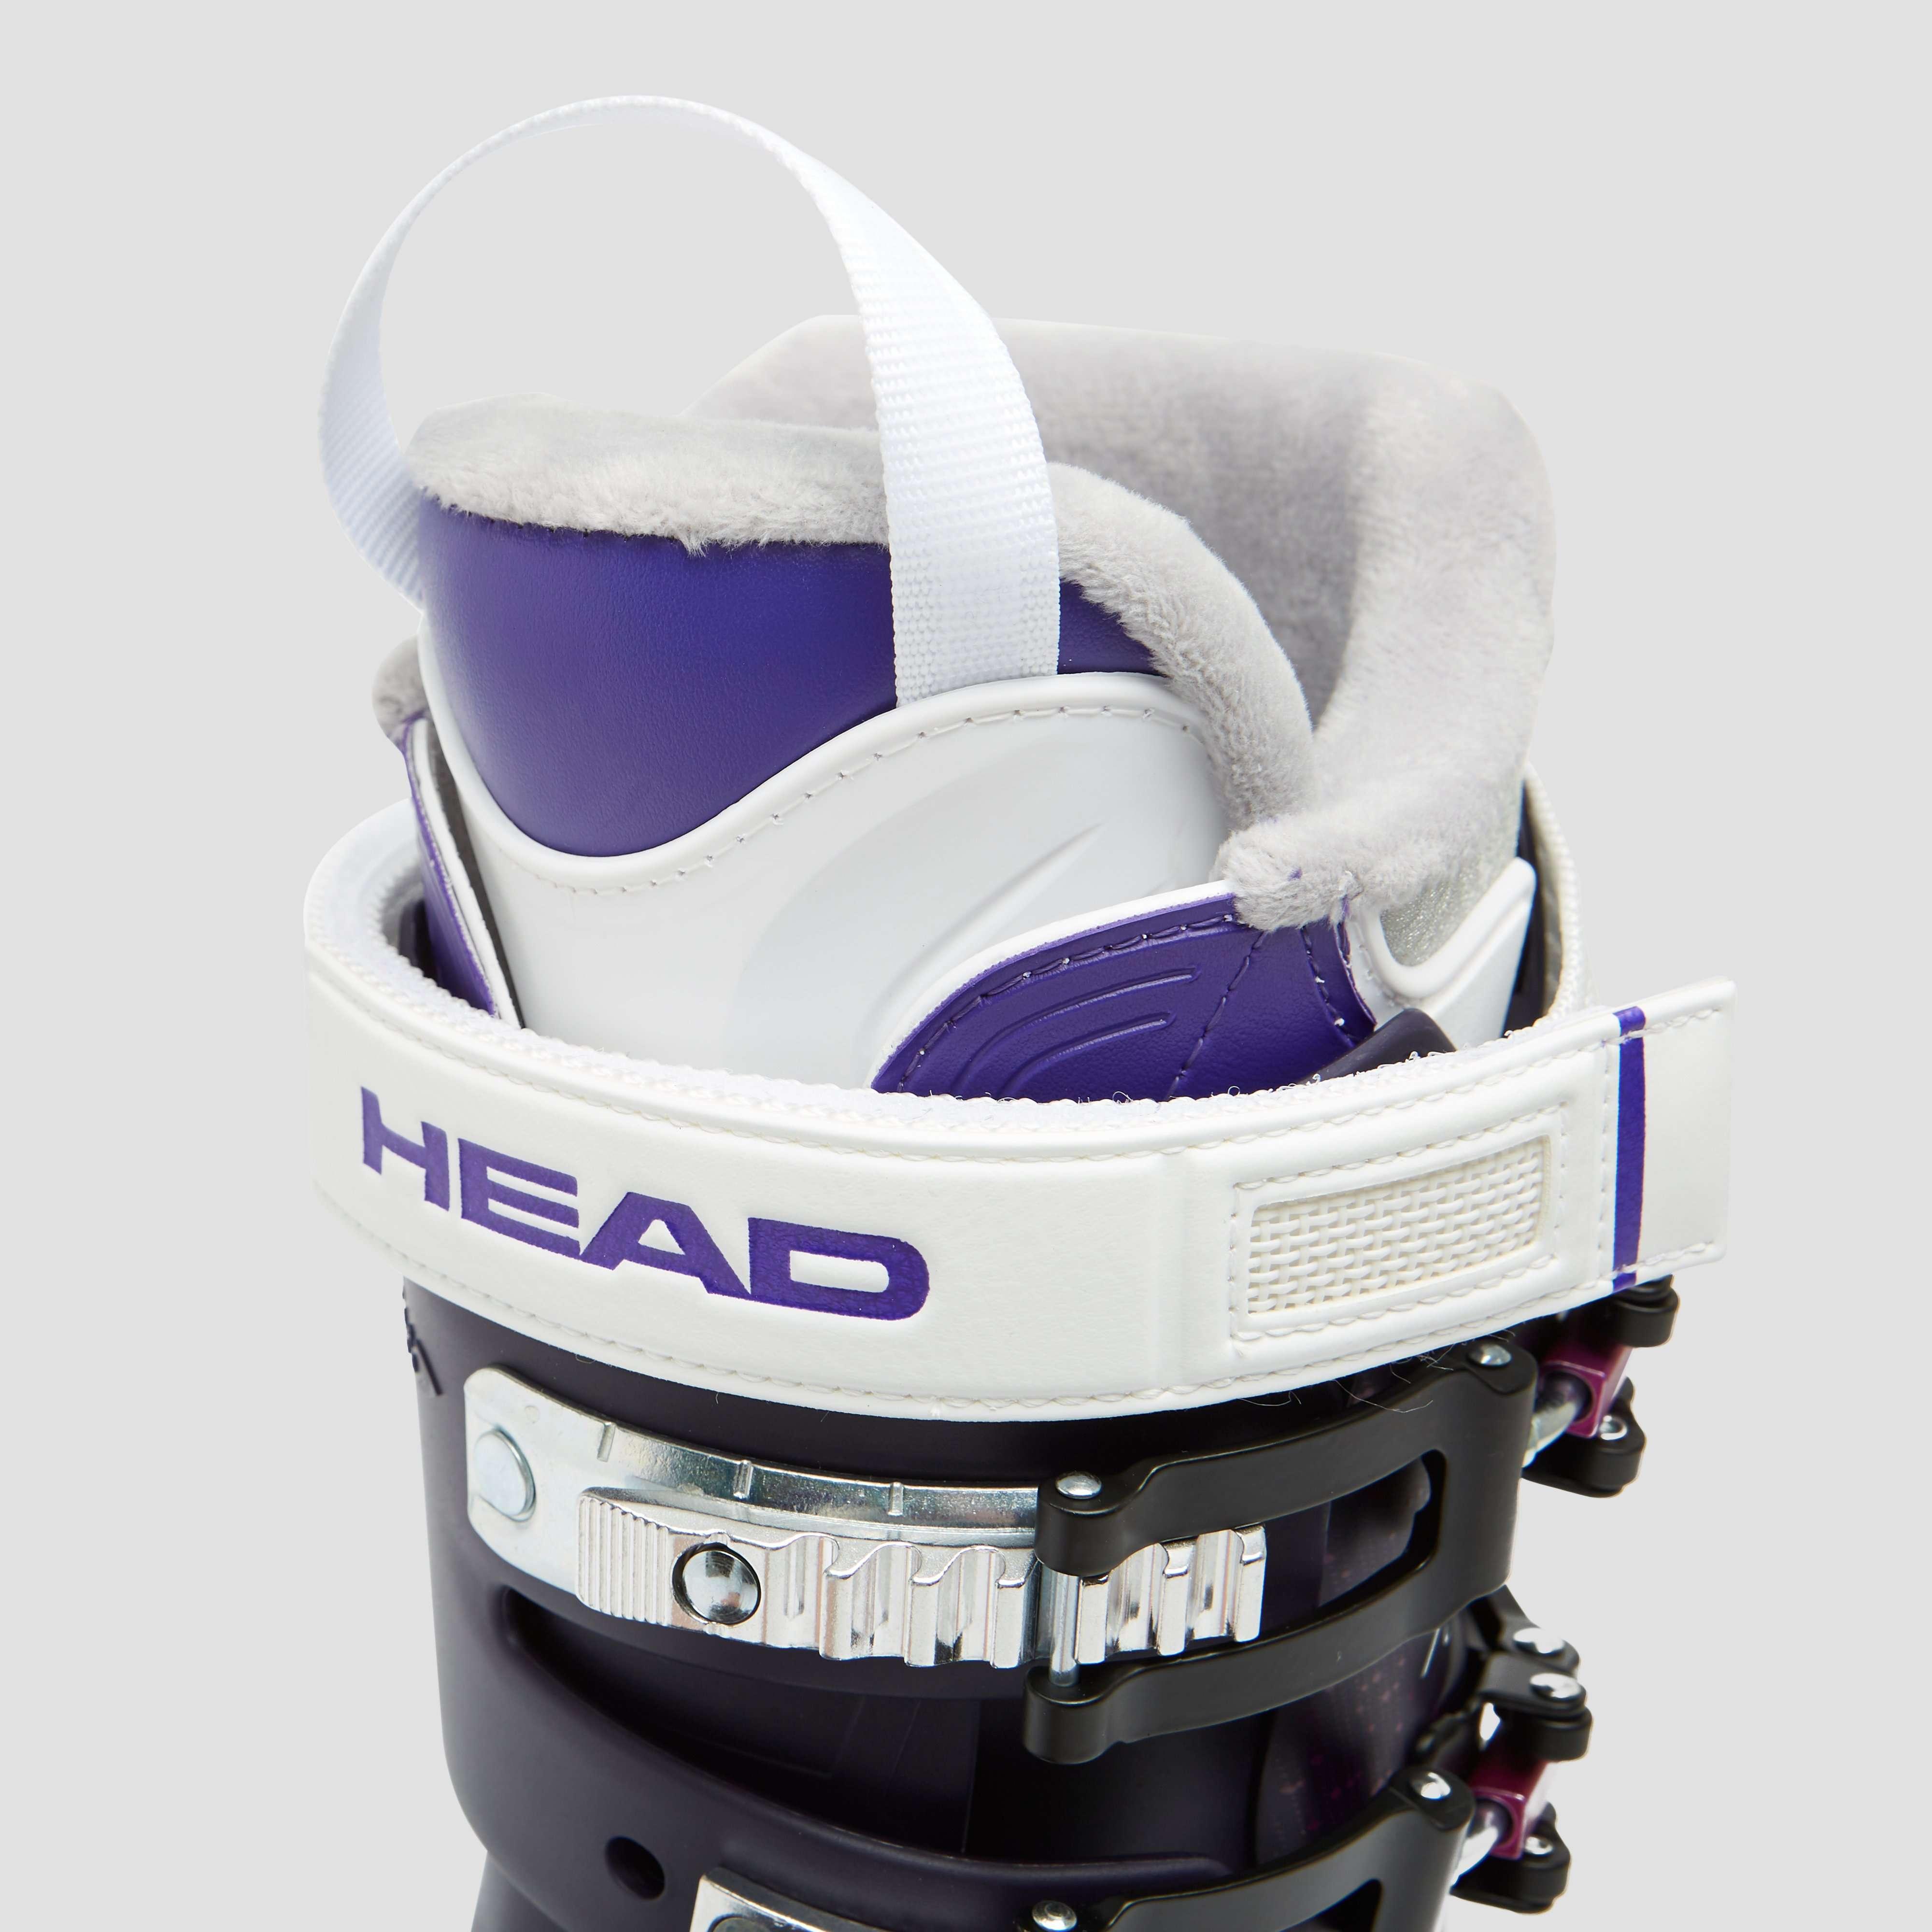 HEAD ADVANT EDGE 75 SKISCHOENEN PAARS DAMES